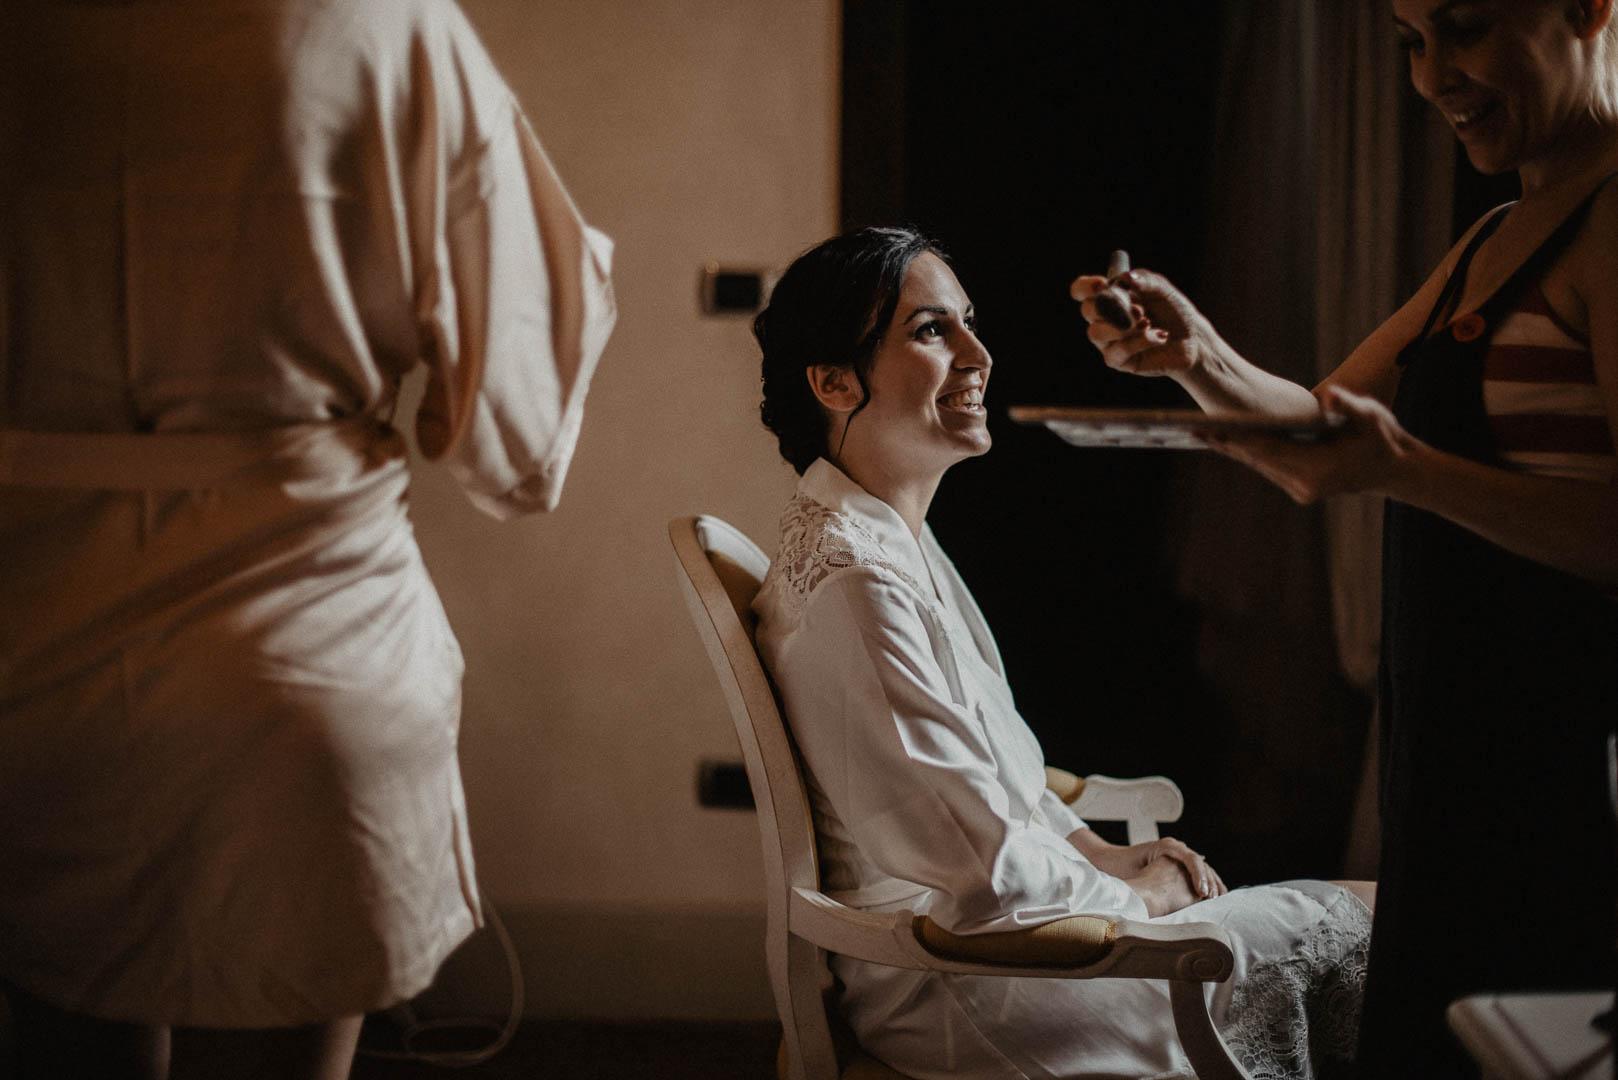 wedding-photographer-destination-fineart-bespoke-reportage-tuscany-villascorzi-vivianeizzo-spazio46-32